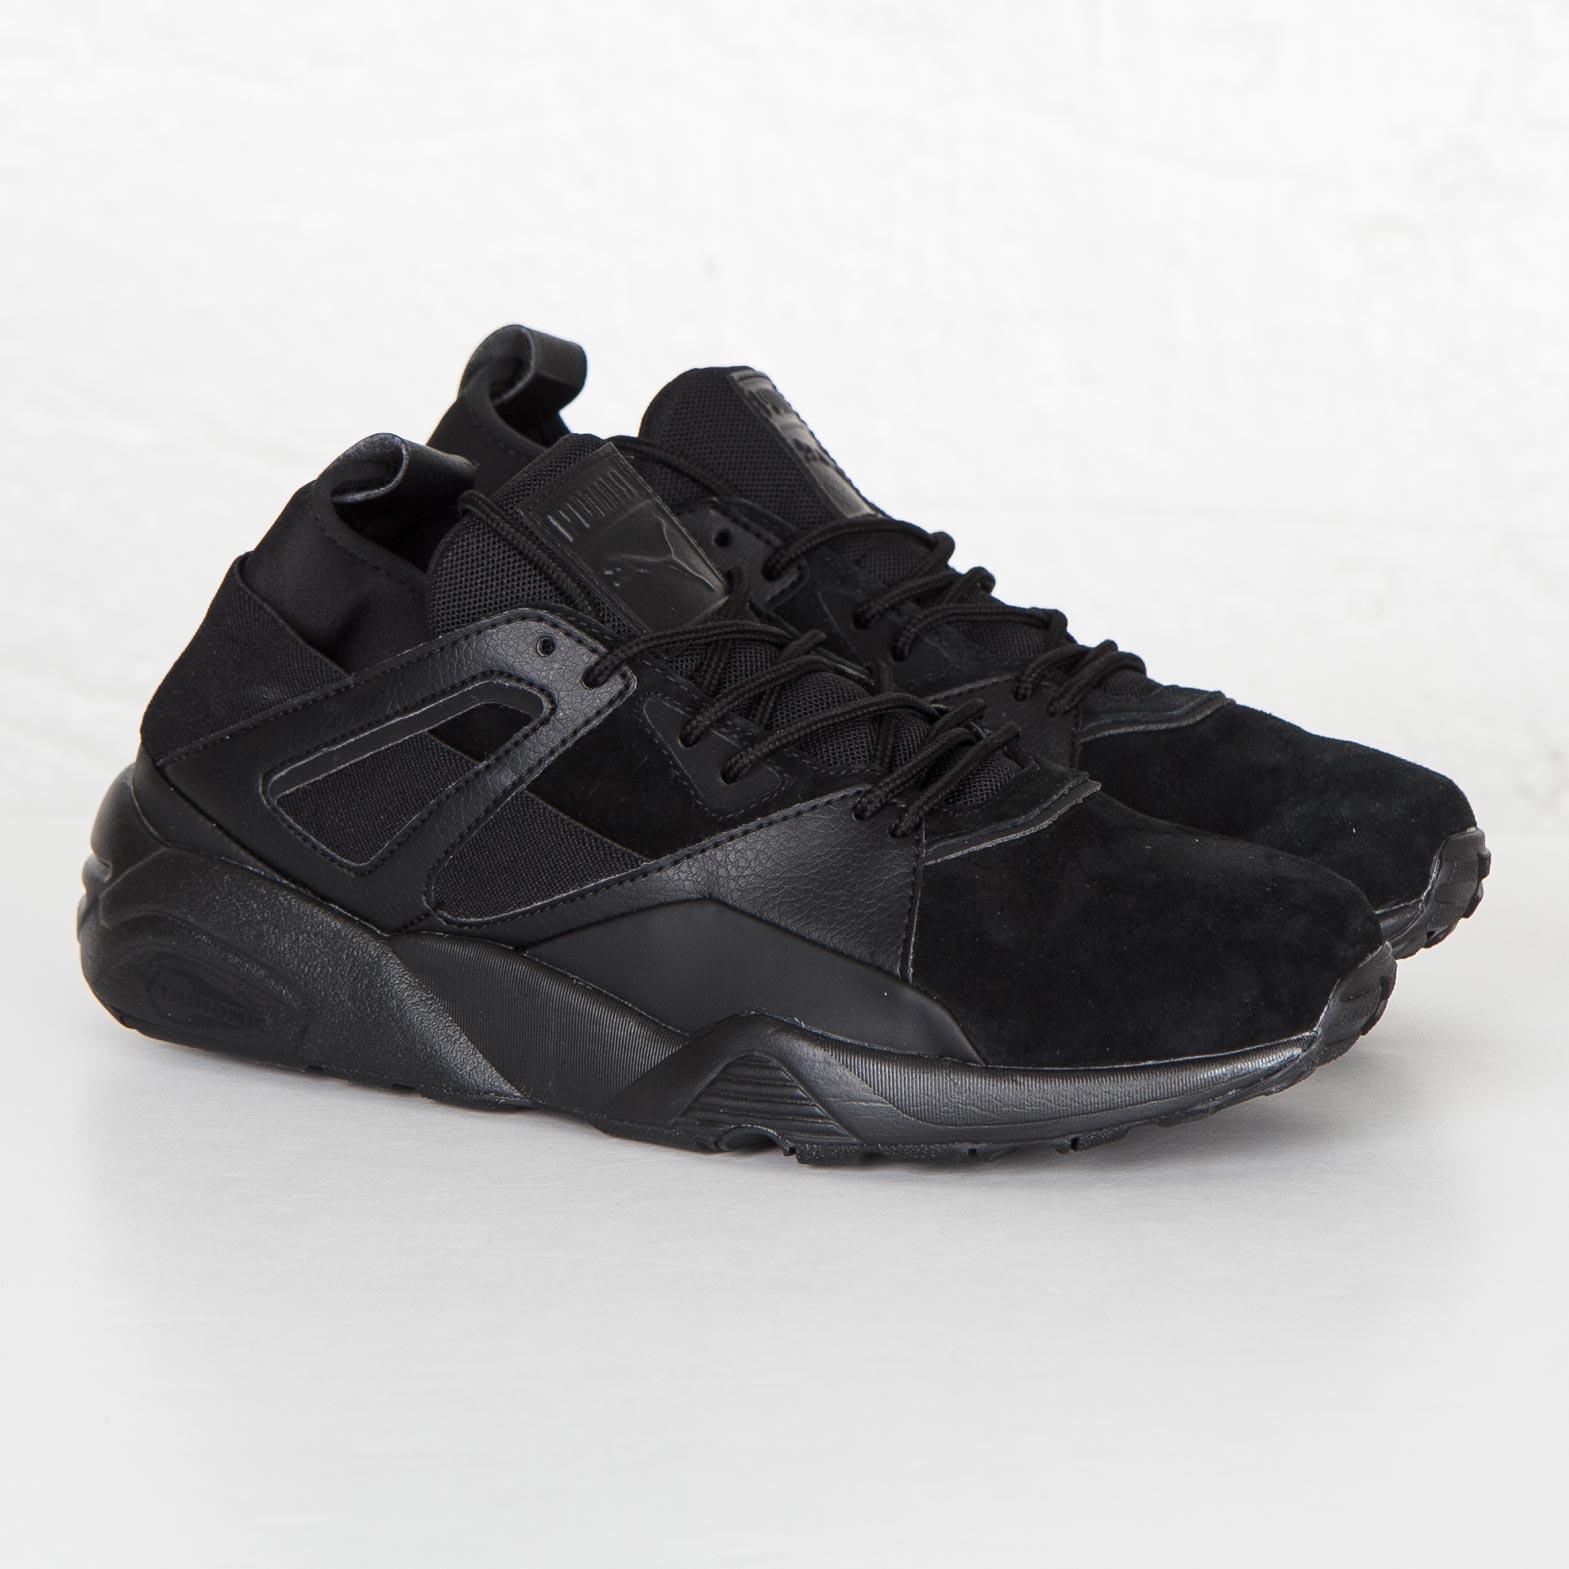 Puma Blaze of Glory Sock Core 362038 01 Sneakersnstuff